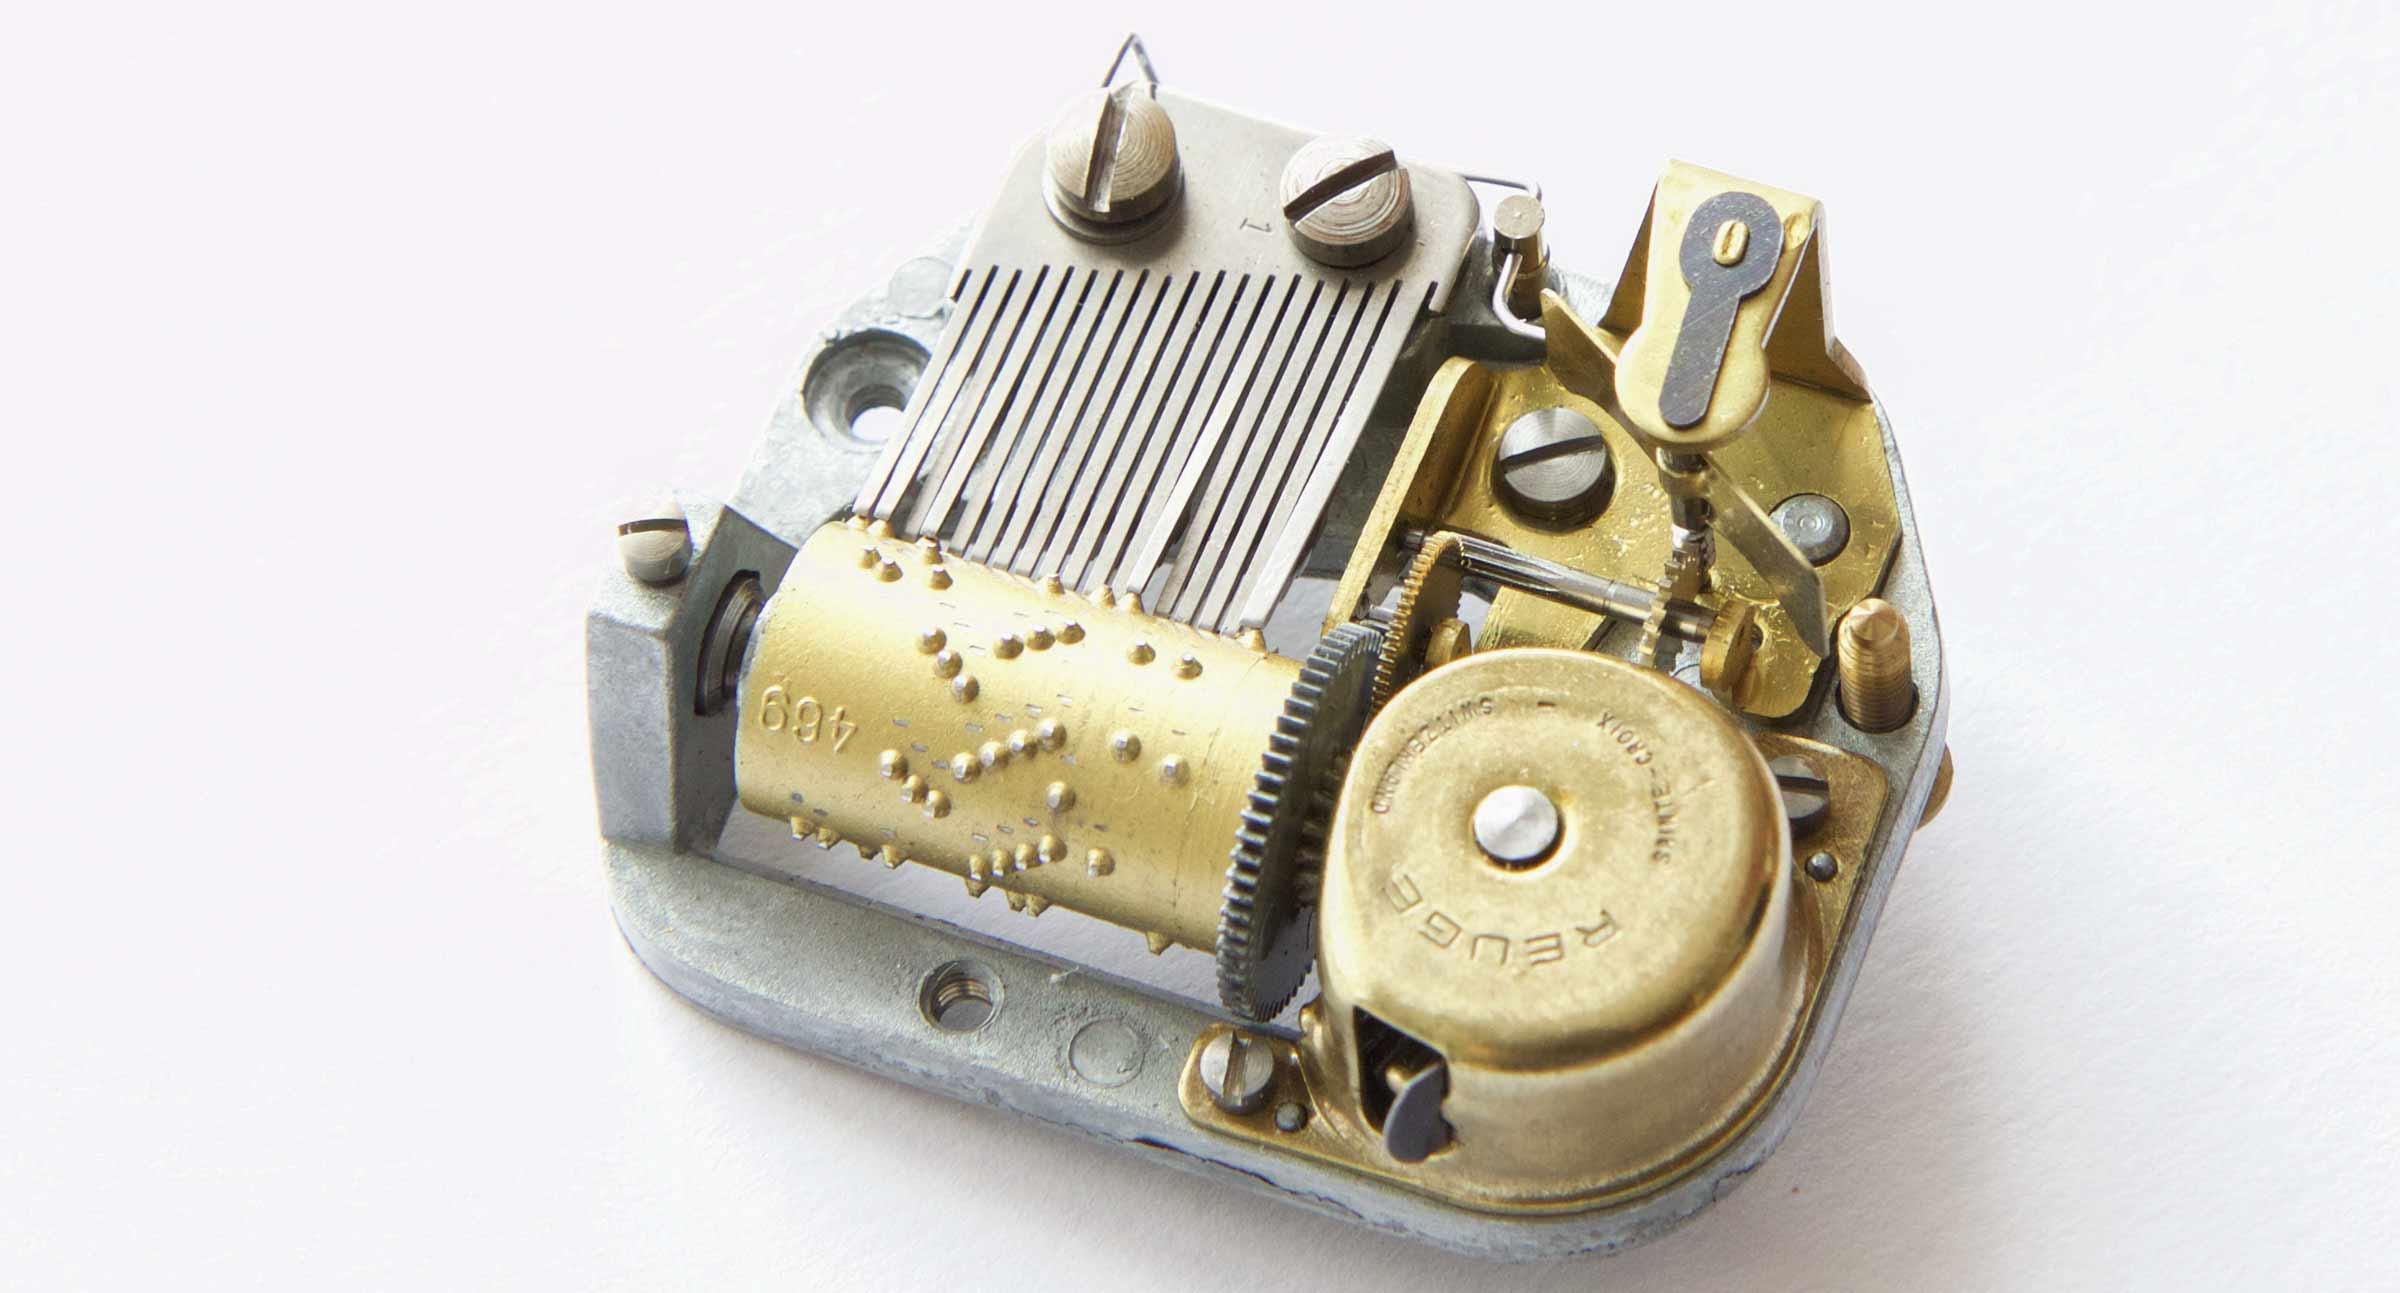 Music box mechanism